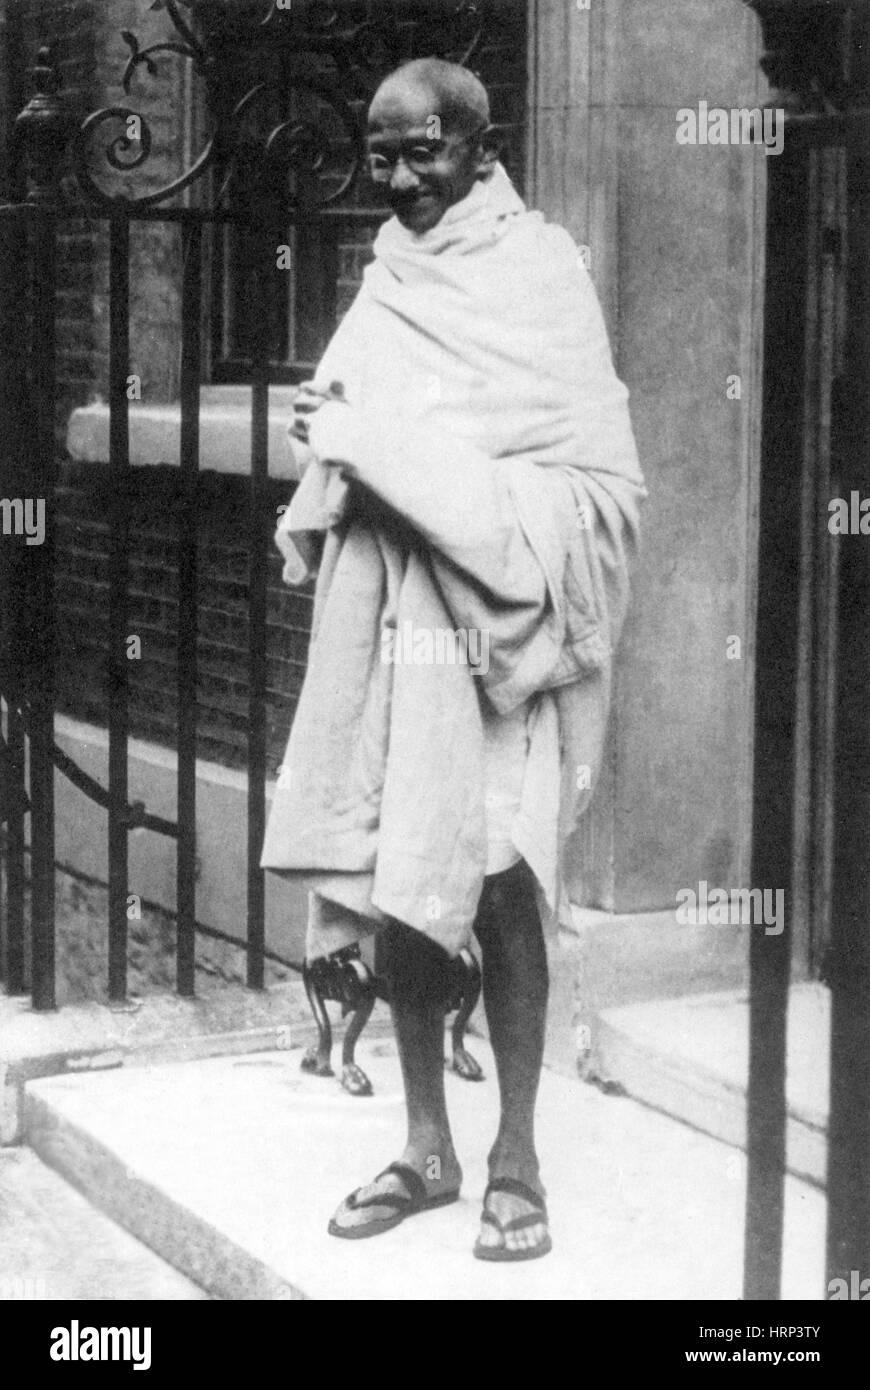 Gandhi, Indian Political/Spiritual Leader - Stock Image